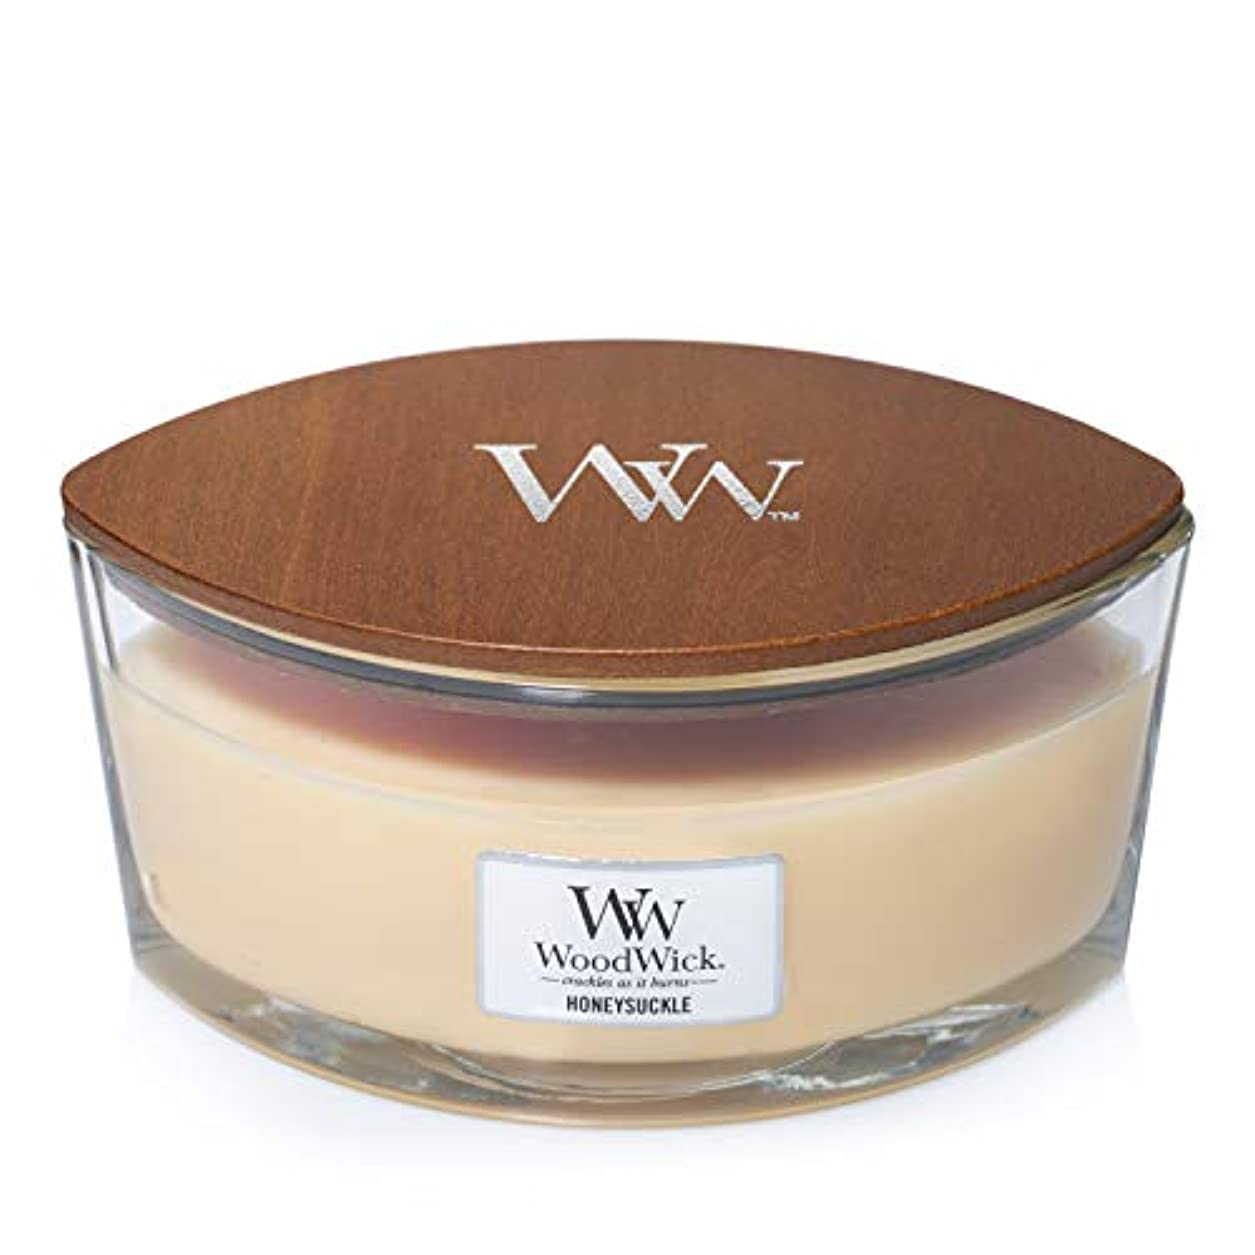 Woodwick Candle Honeysuckle